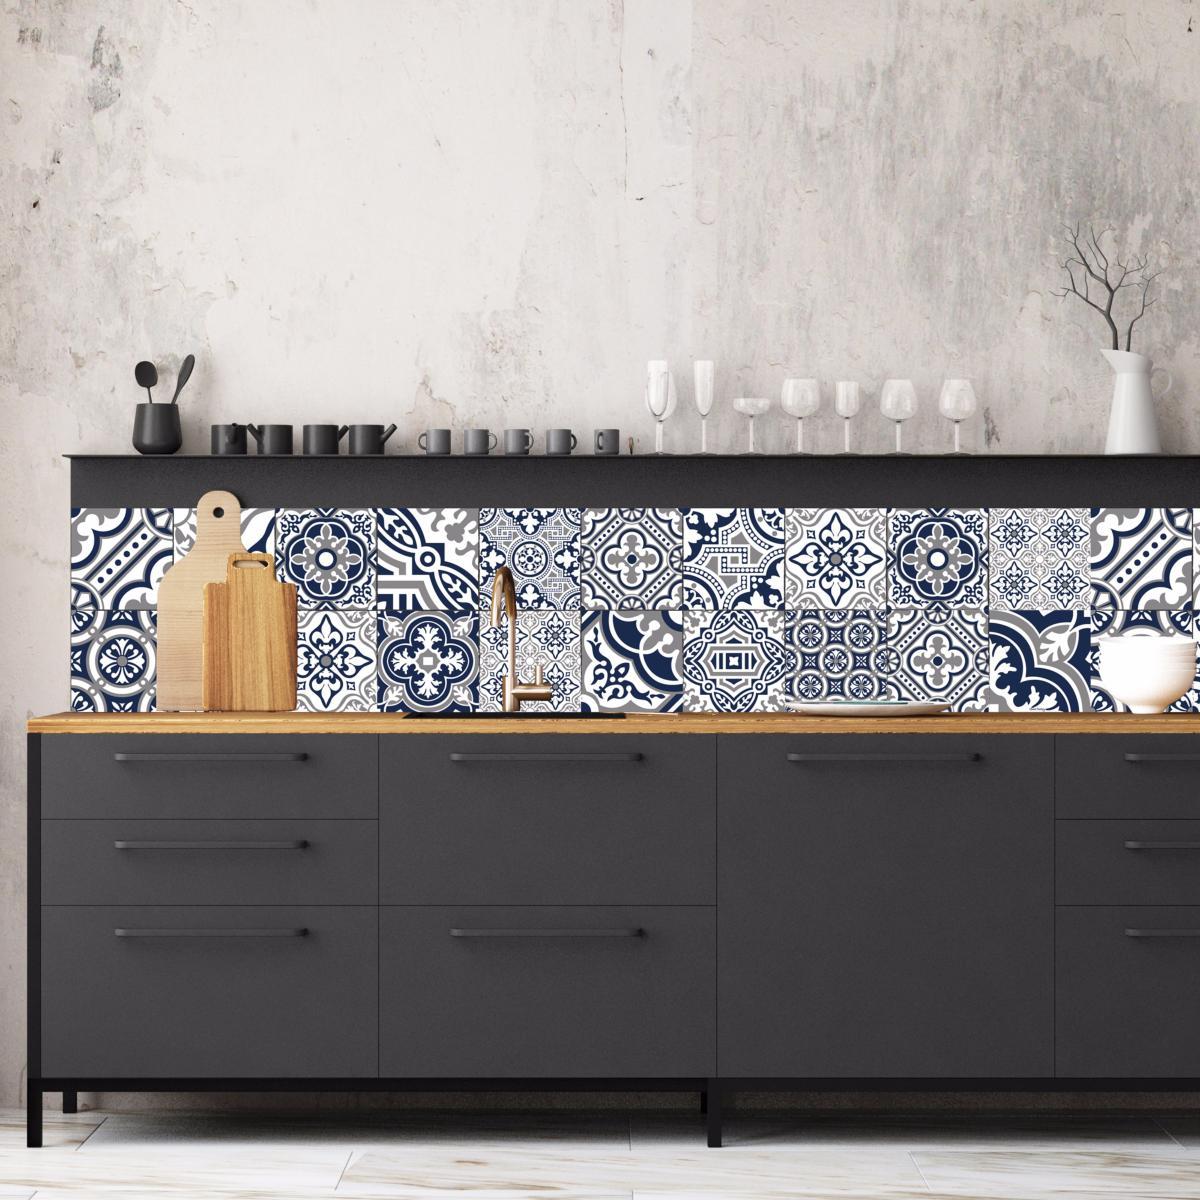 cr dence adh sive carreaux de ciment madeleine bleu nuit. Black Bedroom Furniture Sets. Home Design Ideas